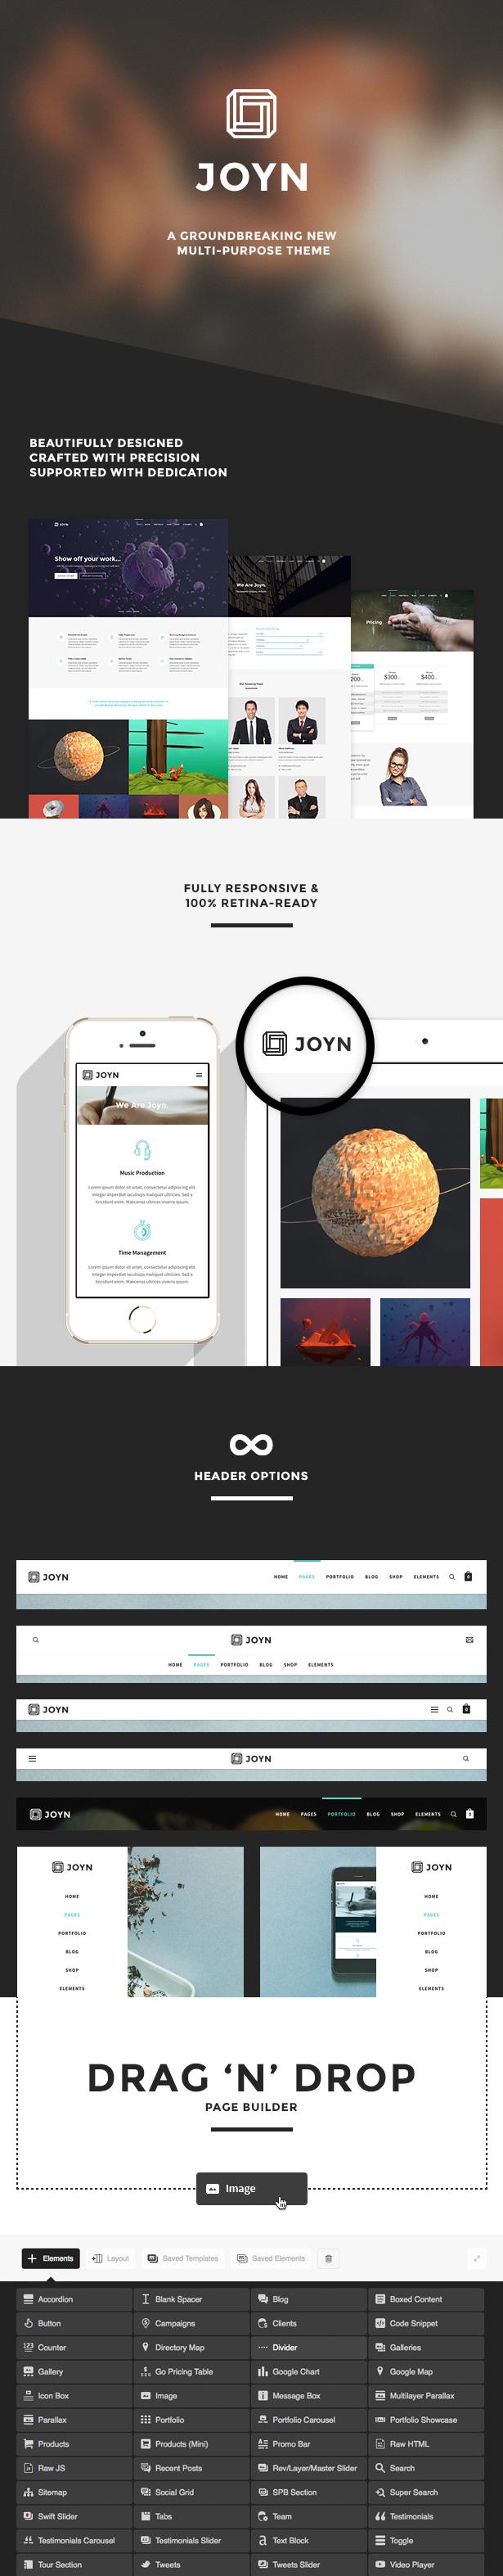 JOYN - Creative Multi-Purpose Theme - 1